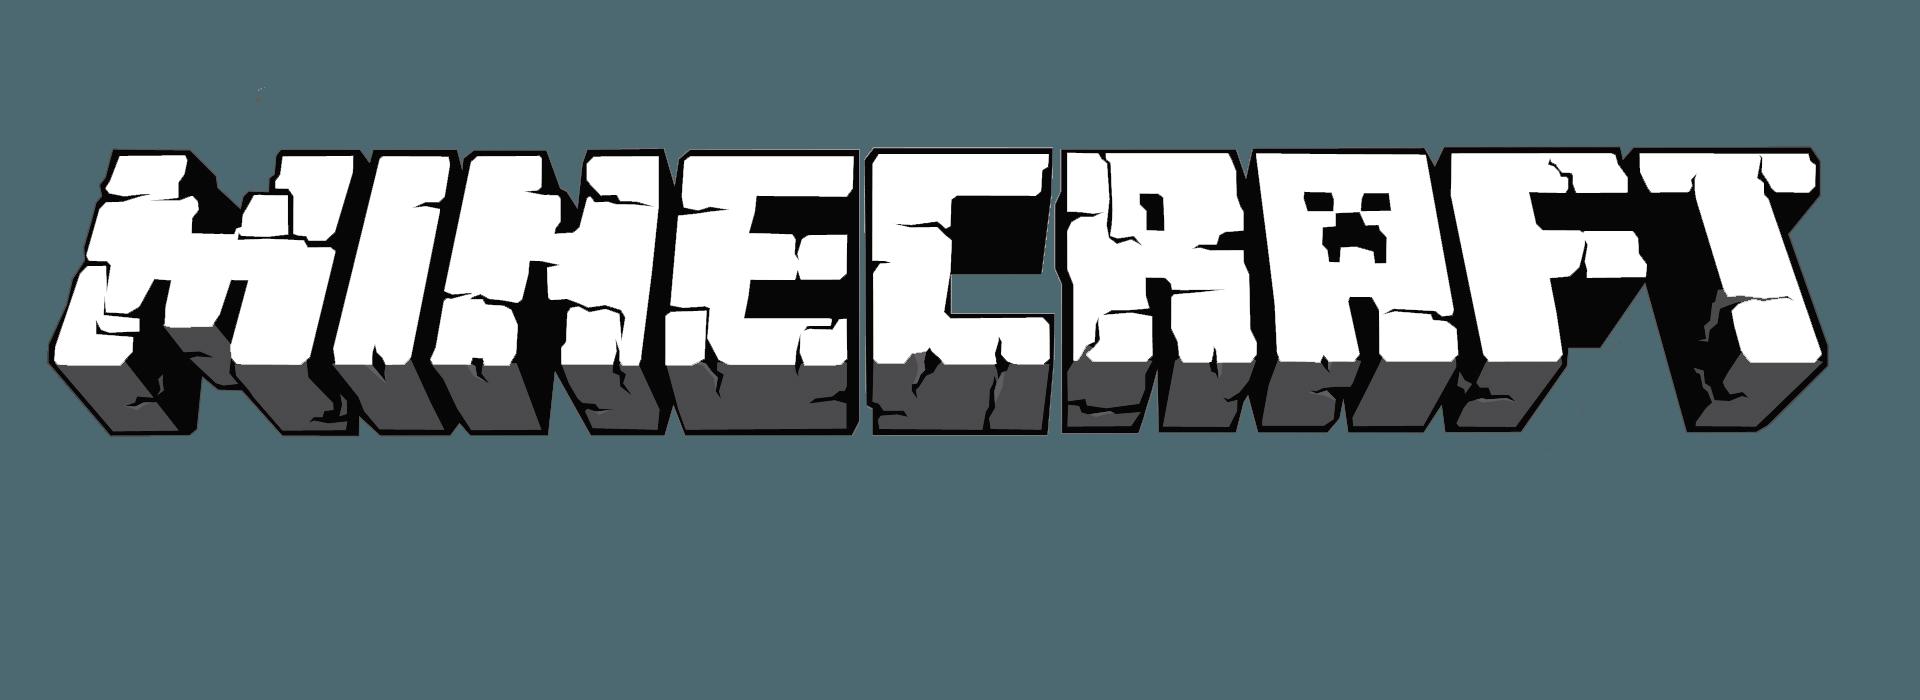 Small Minecraft Logo Logodix